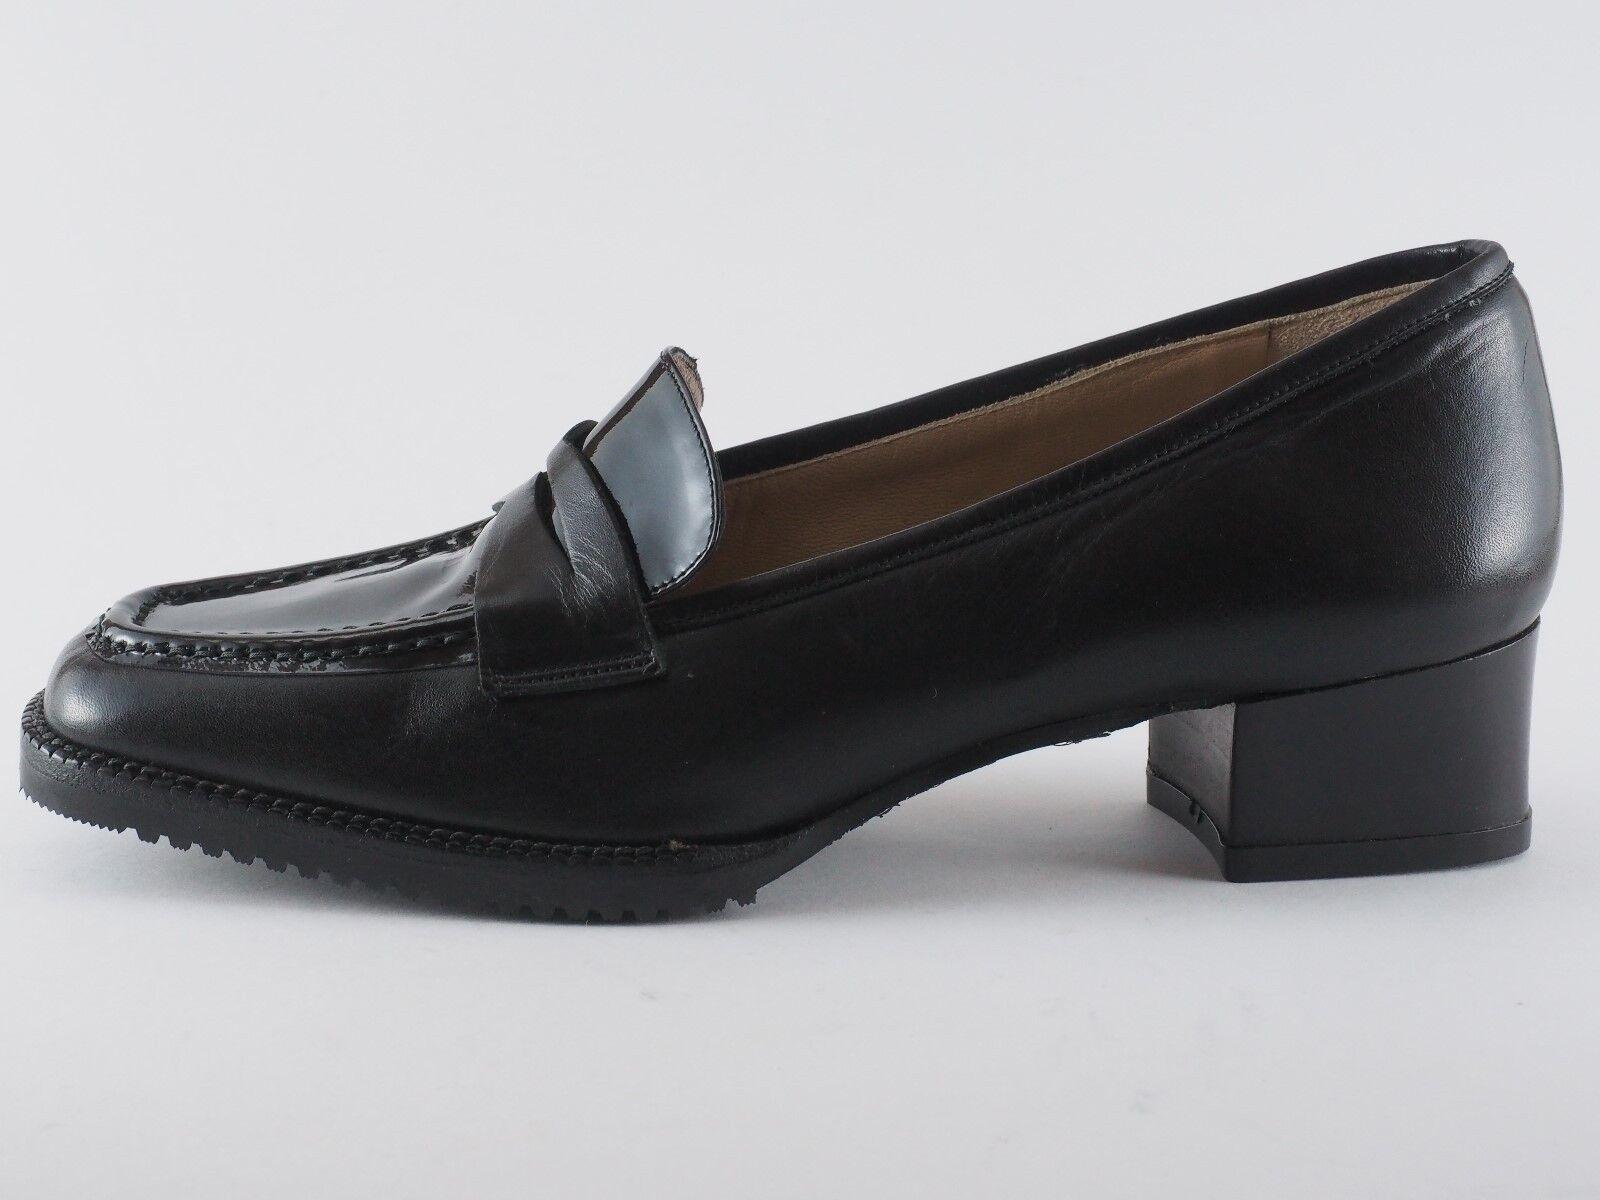 GIORGIO FIORETTI Damen Schuhe 36 38,5 41,5 Leder Lack Schwarz Pumps NEU